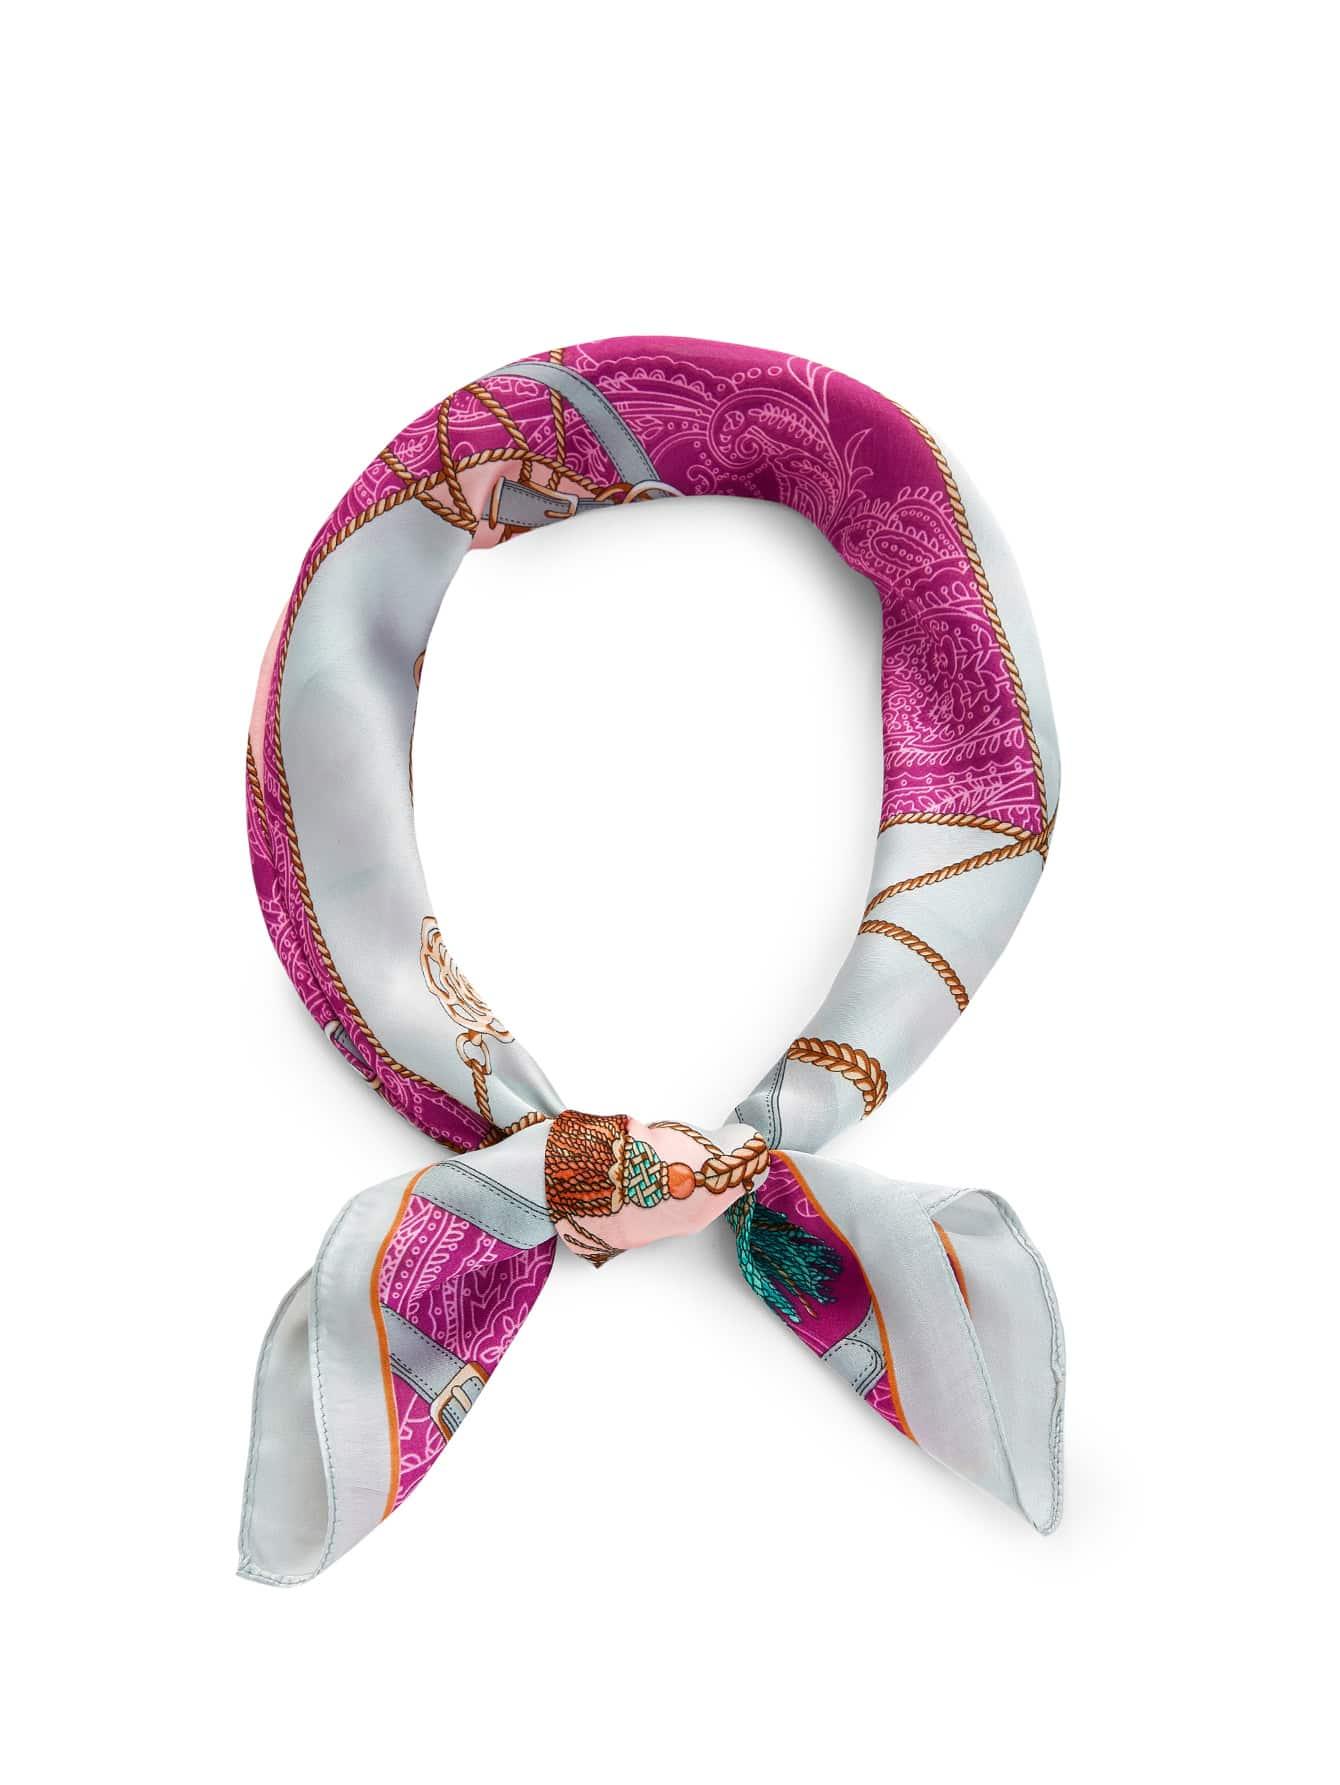 Tassel & Chain Print Bandana calico print satin bandana